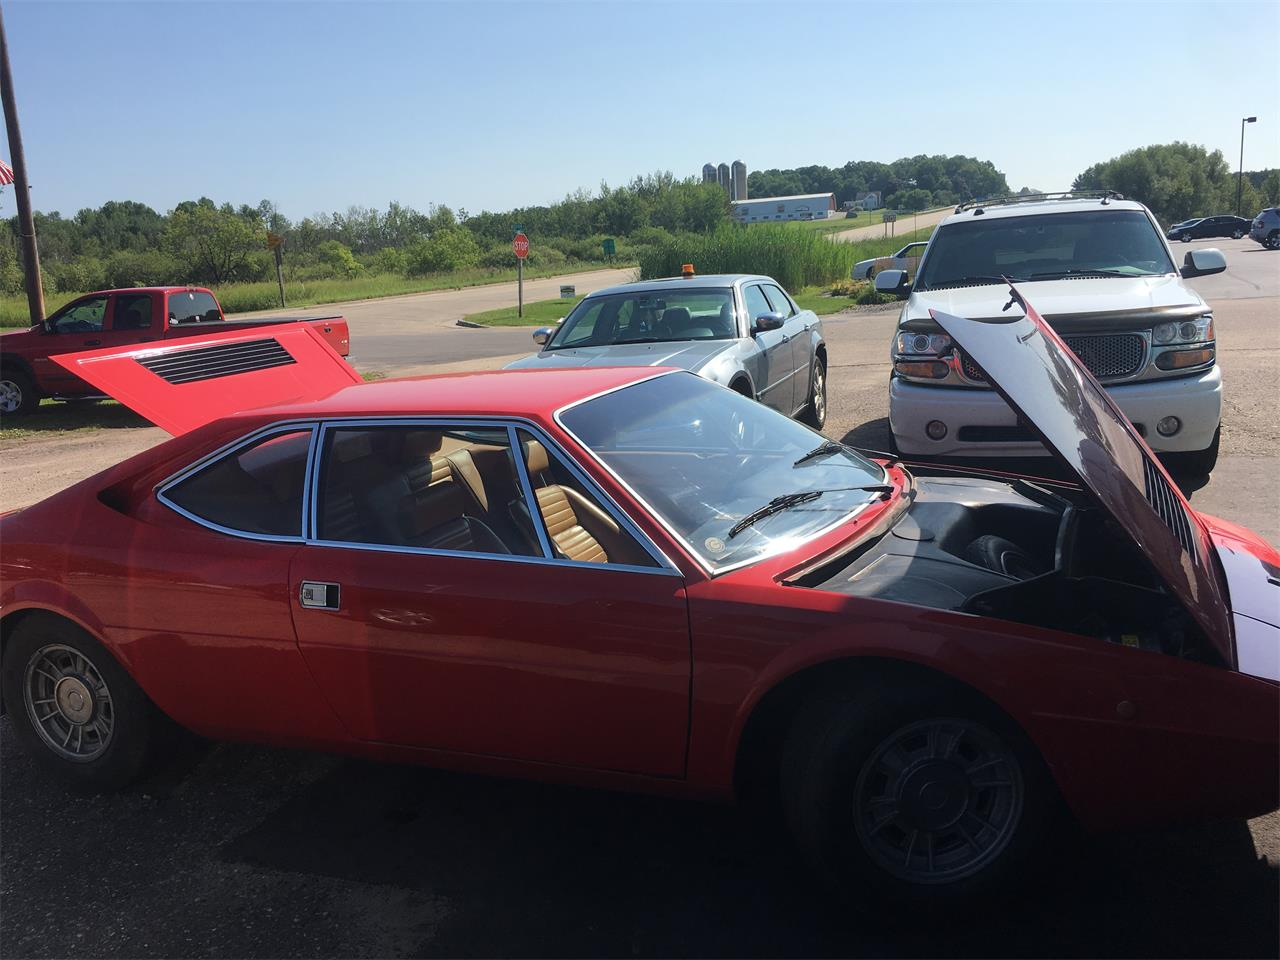 1976 Ferrari 308 GT/4 (CC-1244144) for sale in Wittenberg, Wisconsin